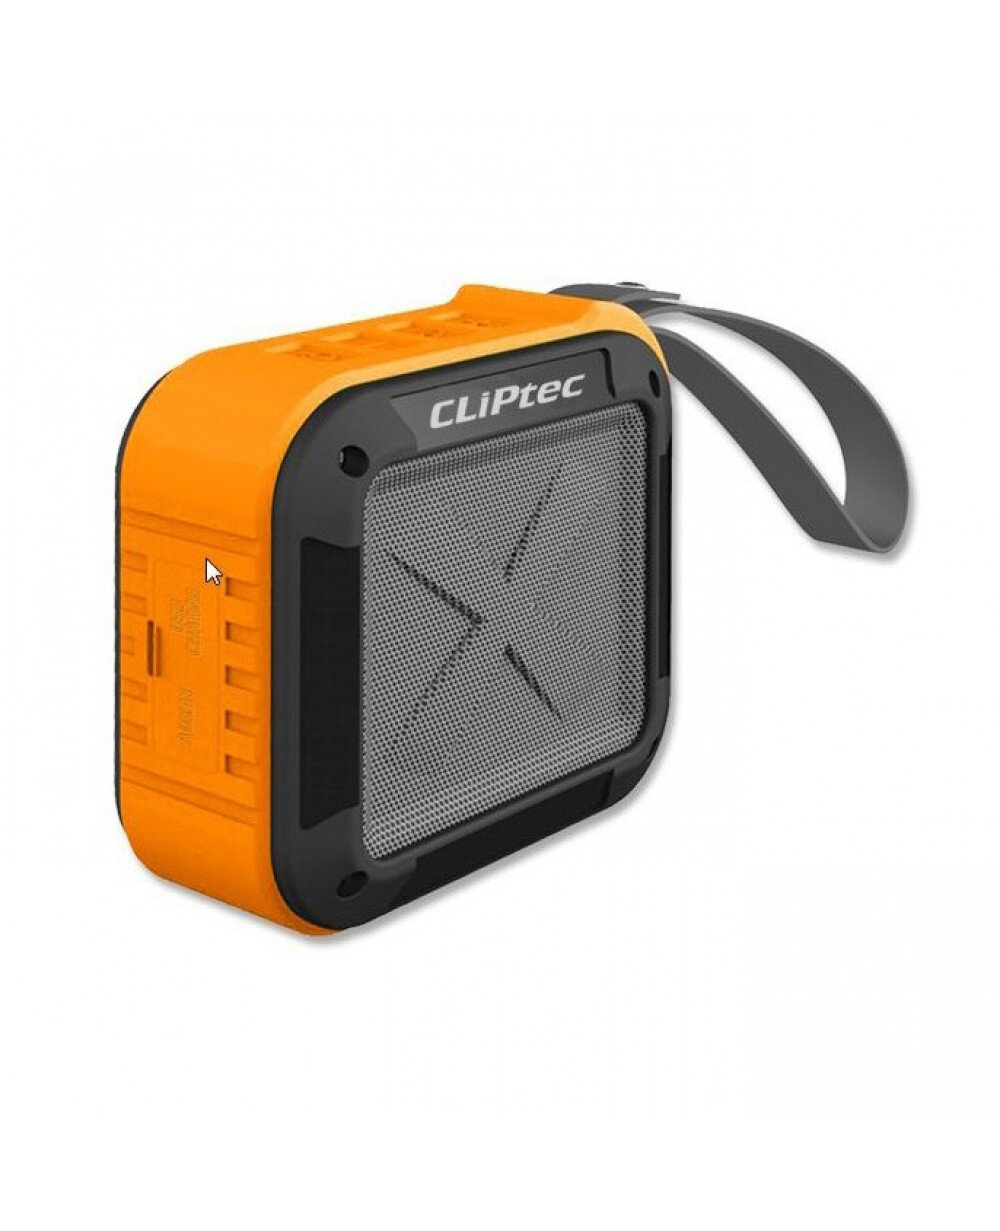 Loa Bluetooth Cliptec PBS262